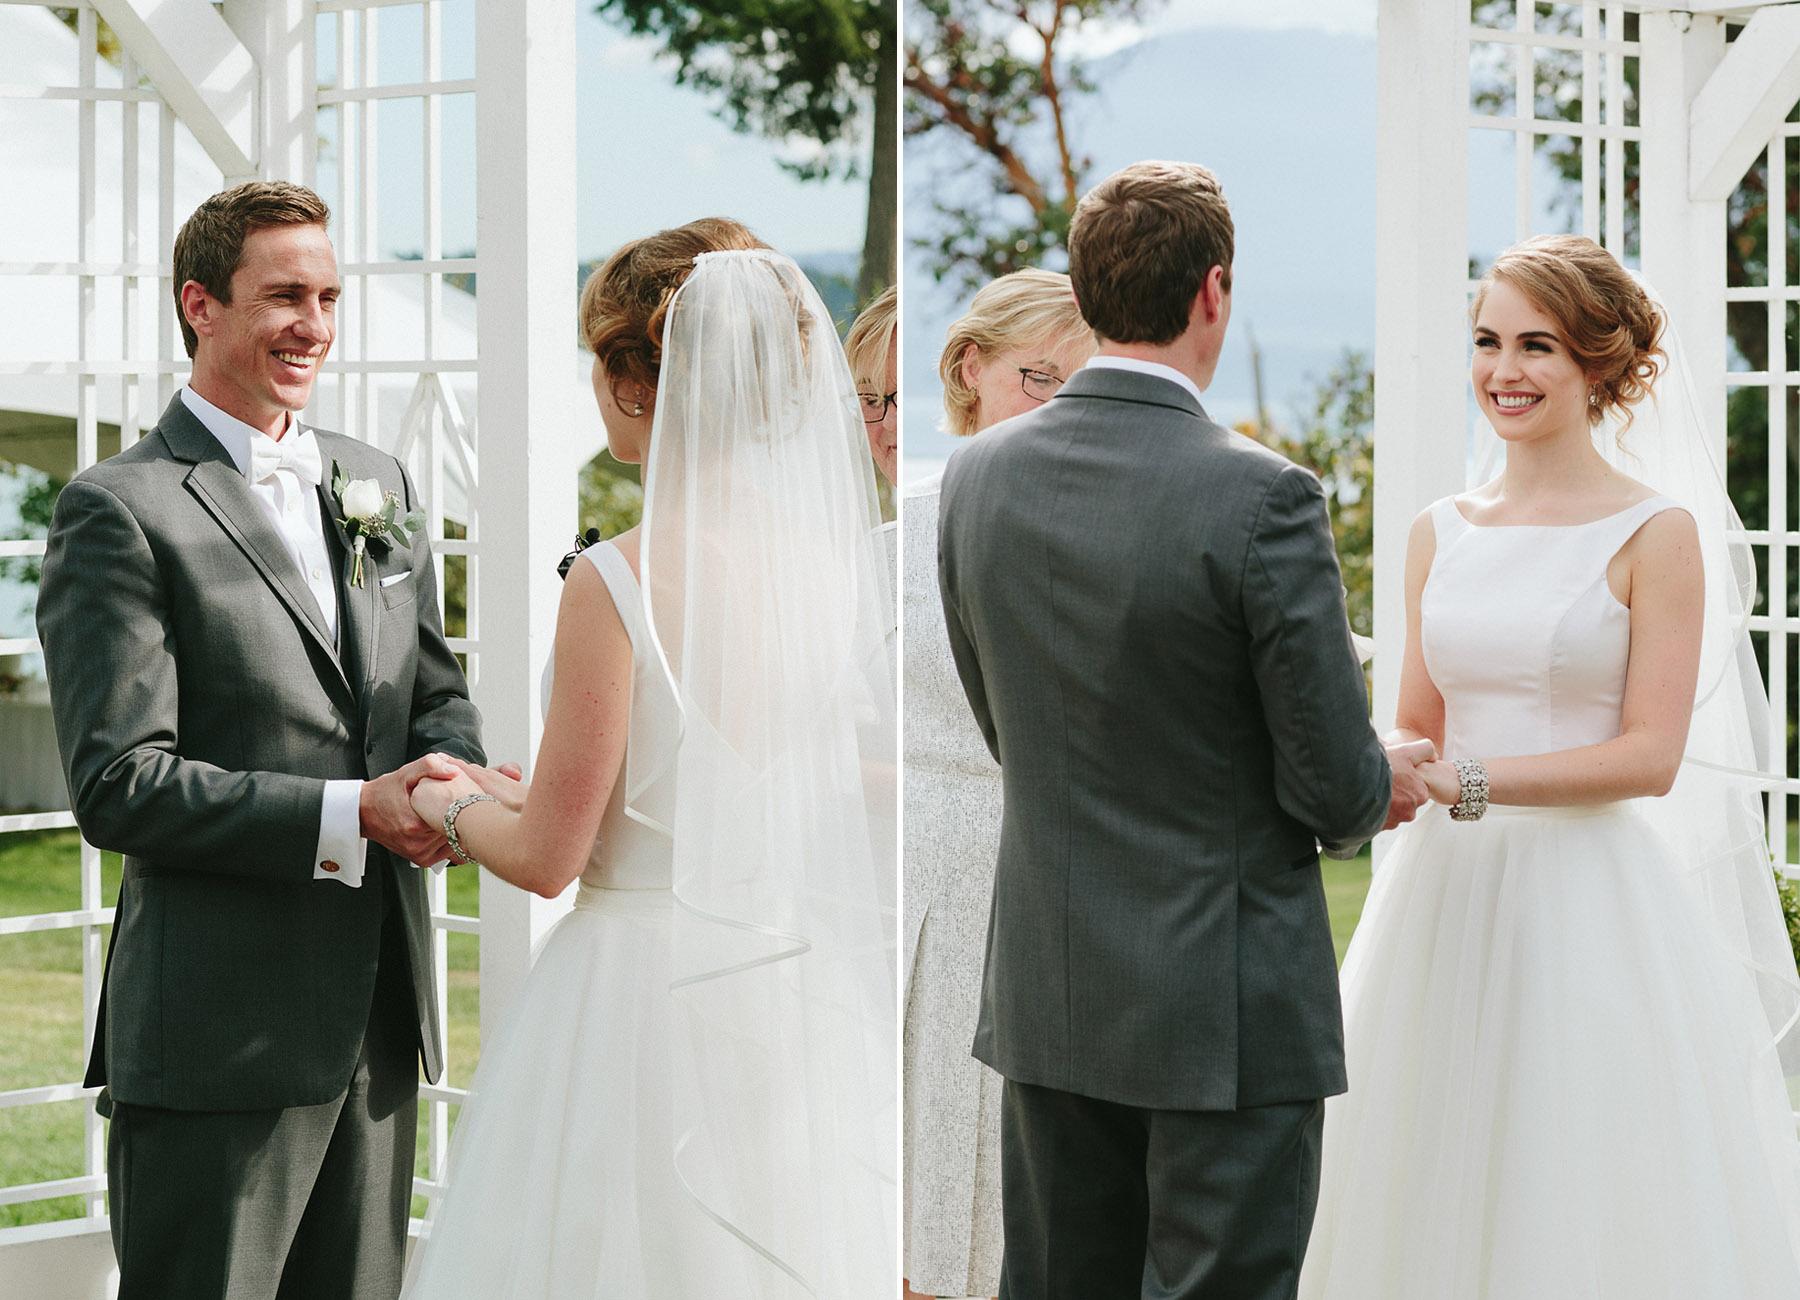 thetis-island-wedding-photographer-rp-rn-086.jpg